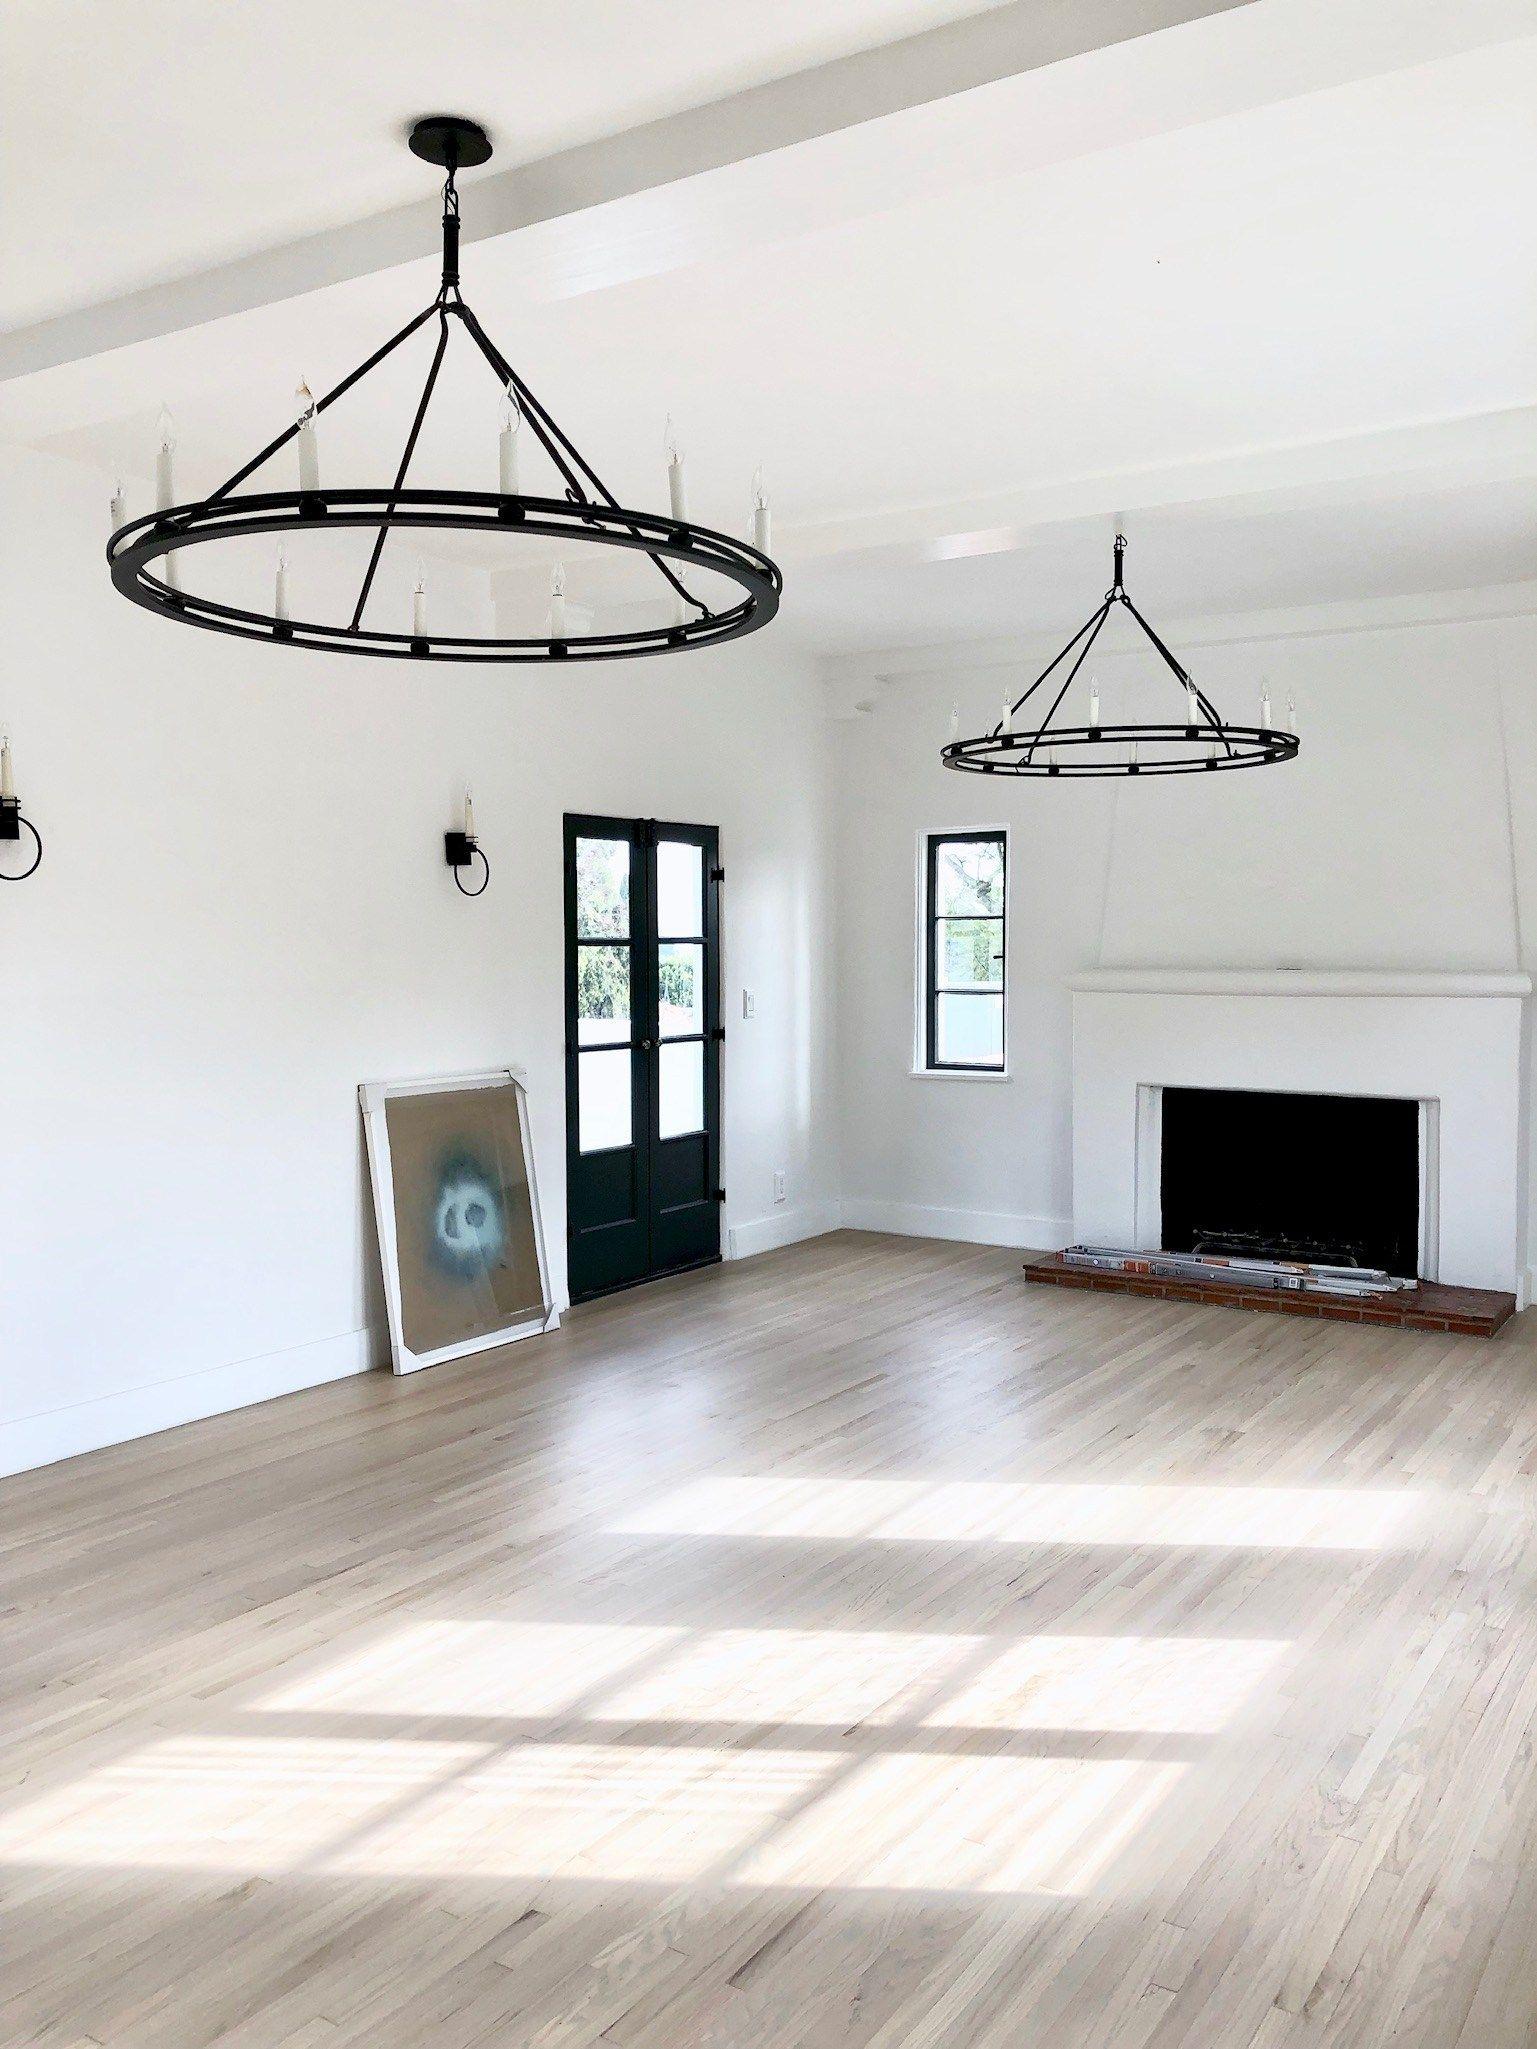 benjamin moore interior paint refresh cococozy design on interior designer paint colors id=59771